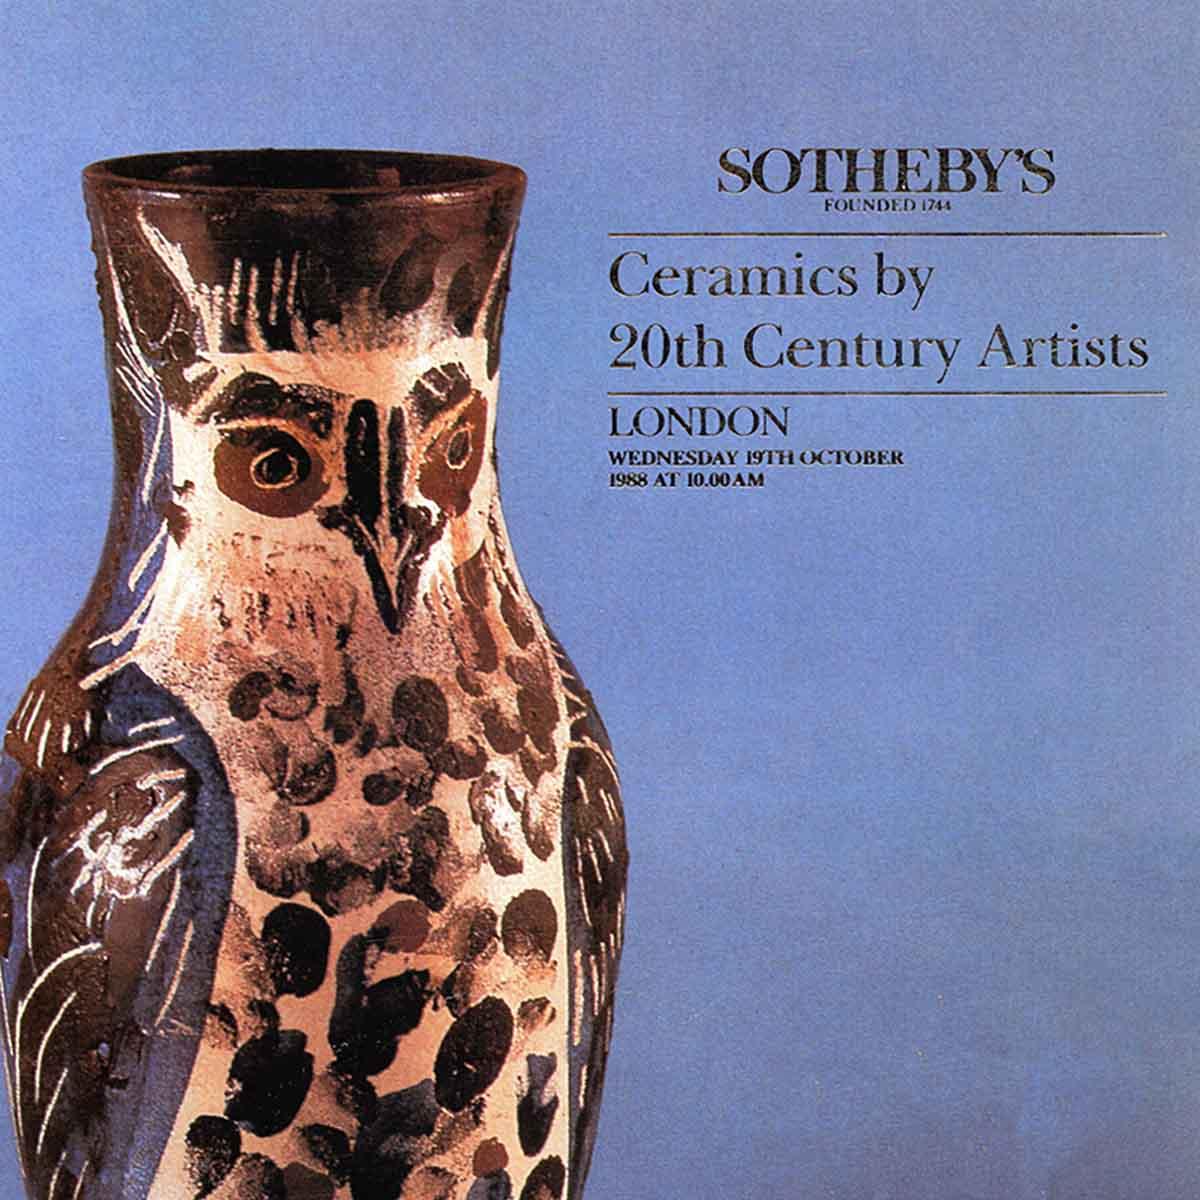 Ceramics by 20th century artists